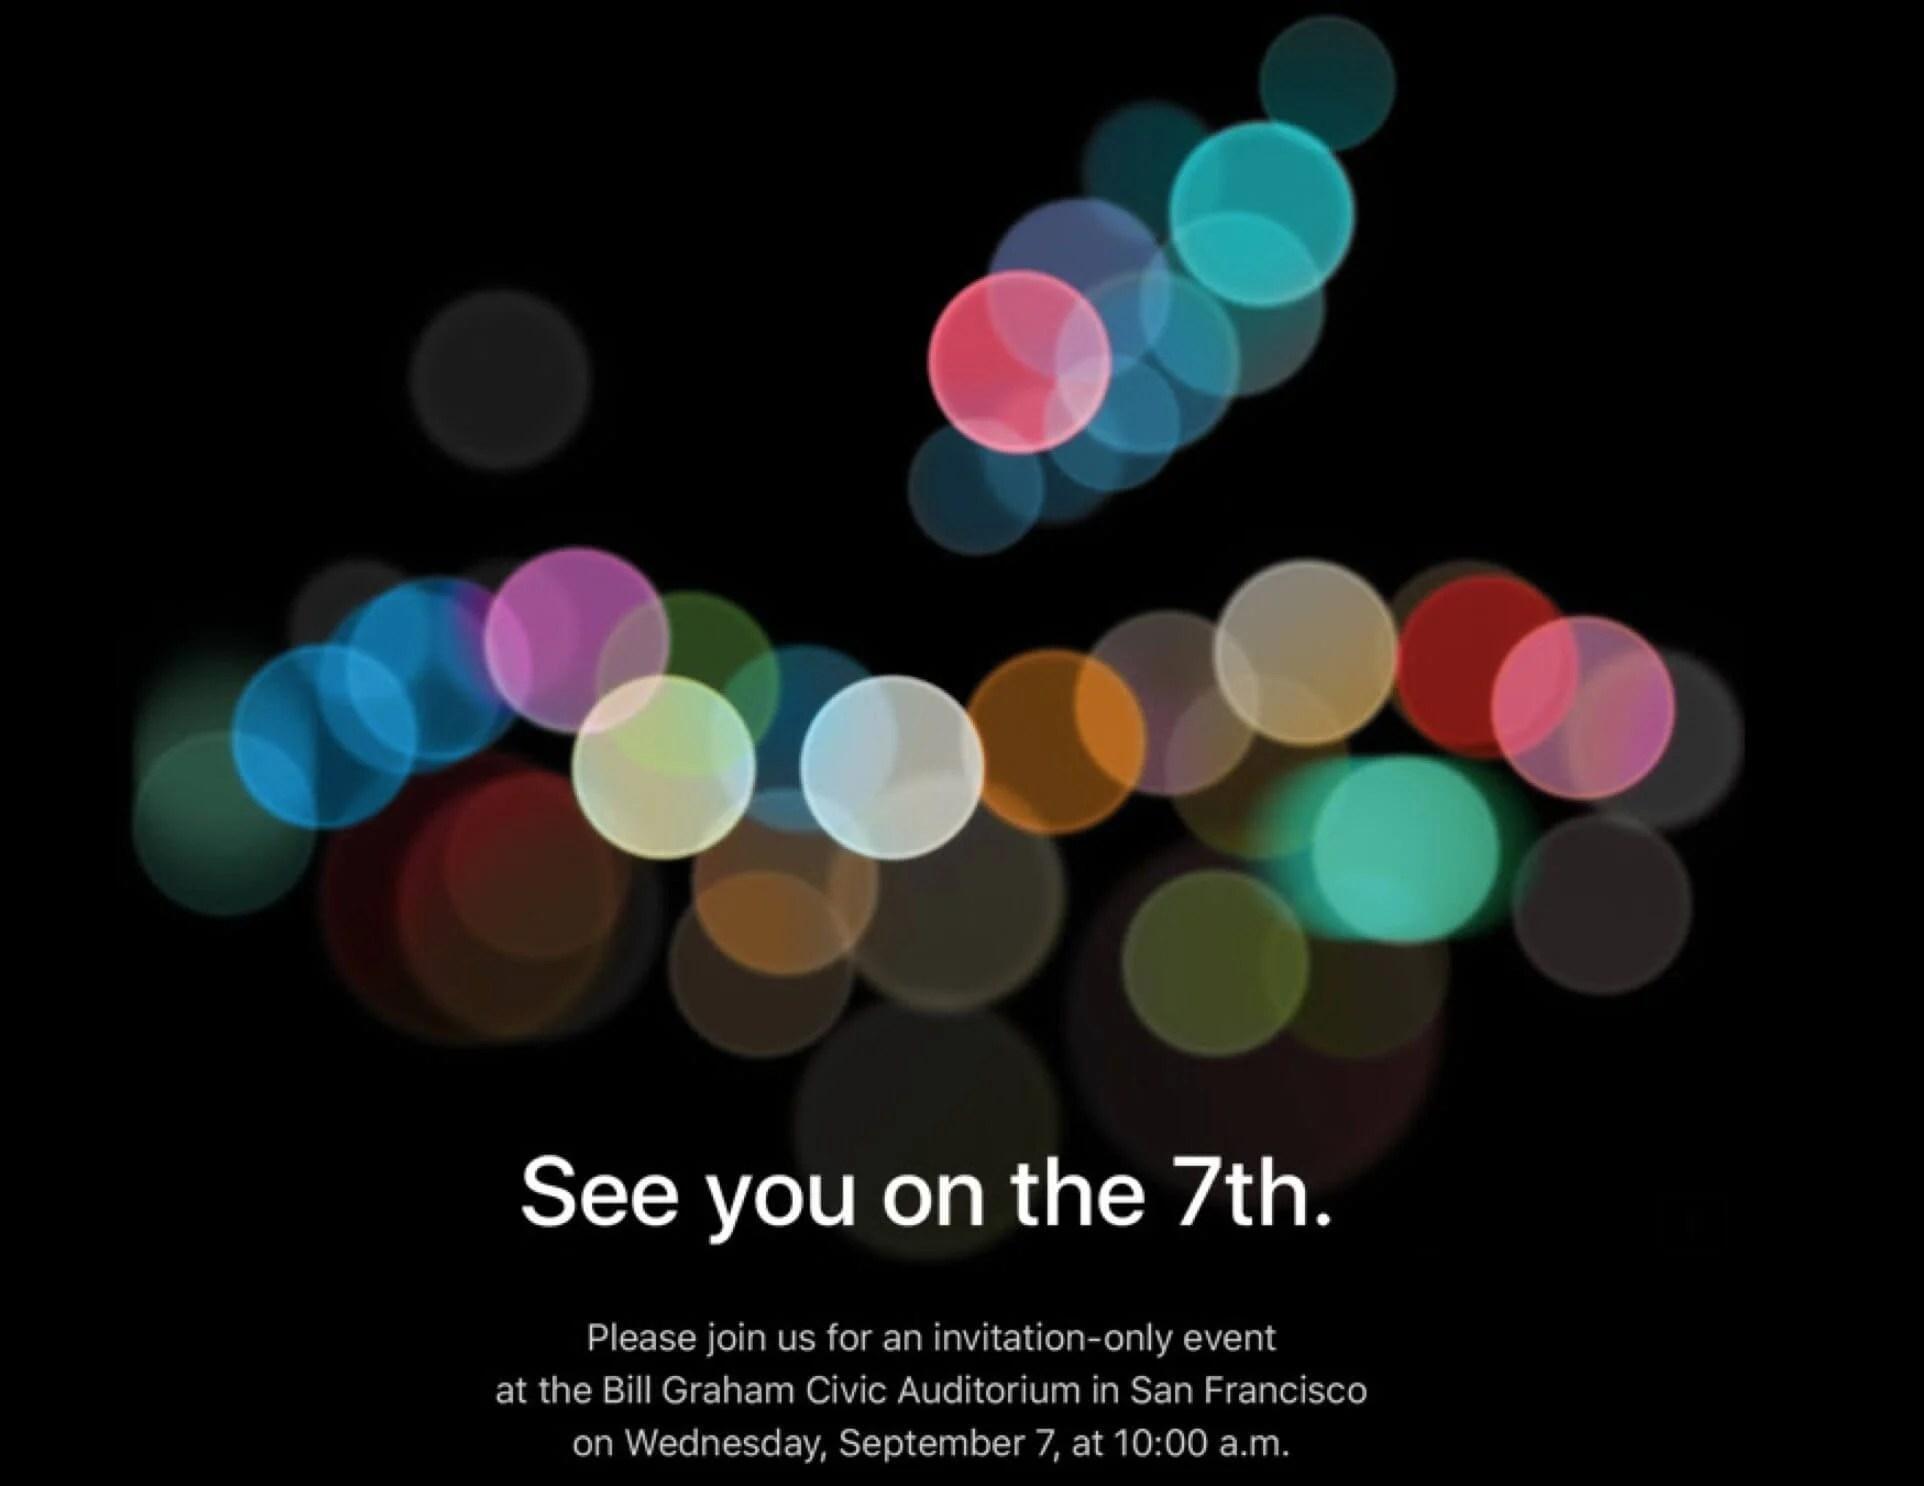 CrCgWVfXYAAfn6p - Evento do iPhone 7 já tem data divulgada pela Apple